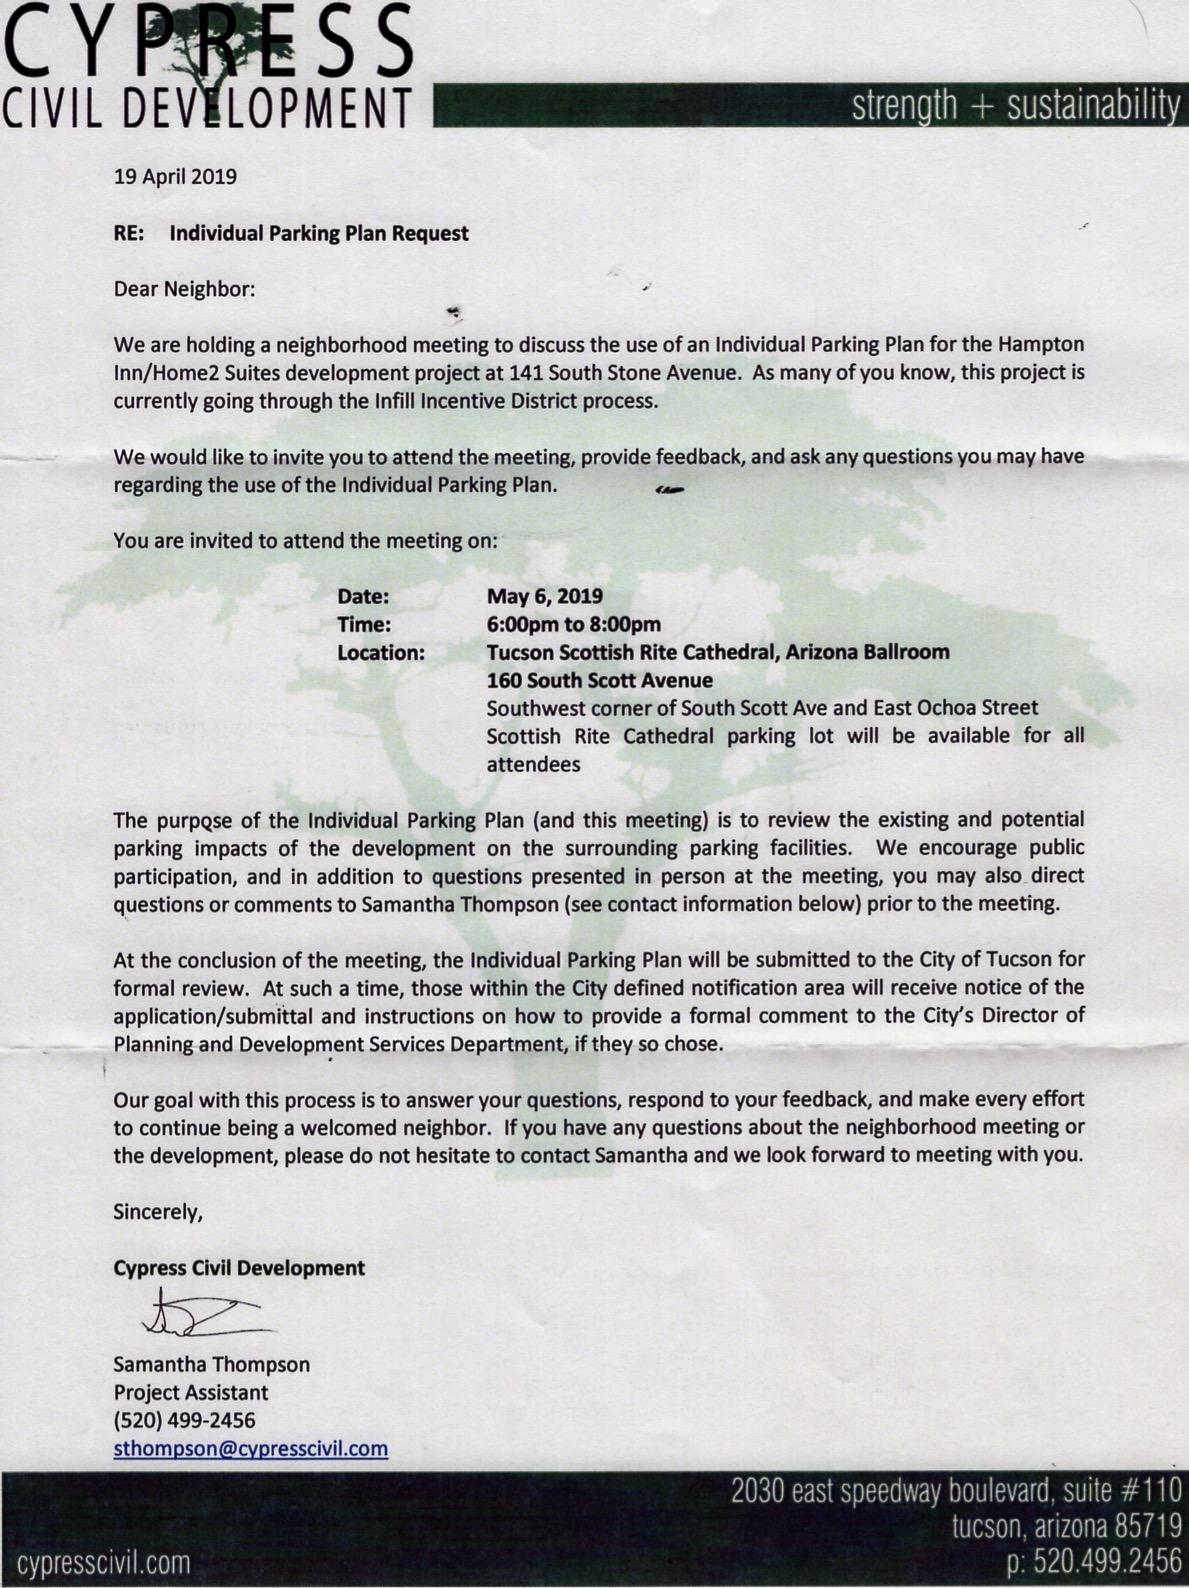 IPP for Hilton notice